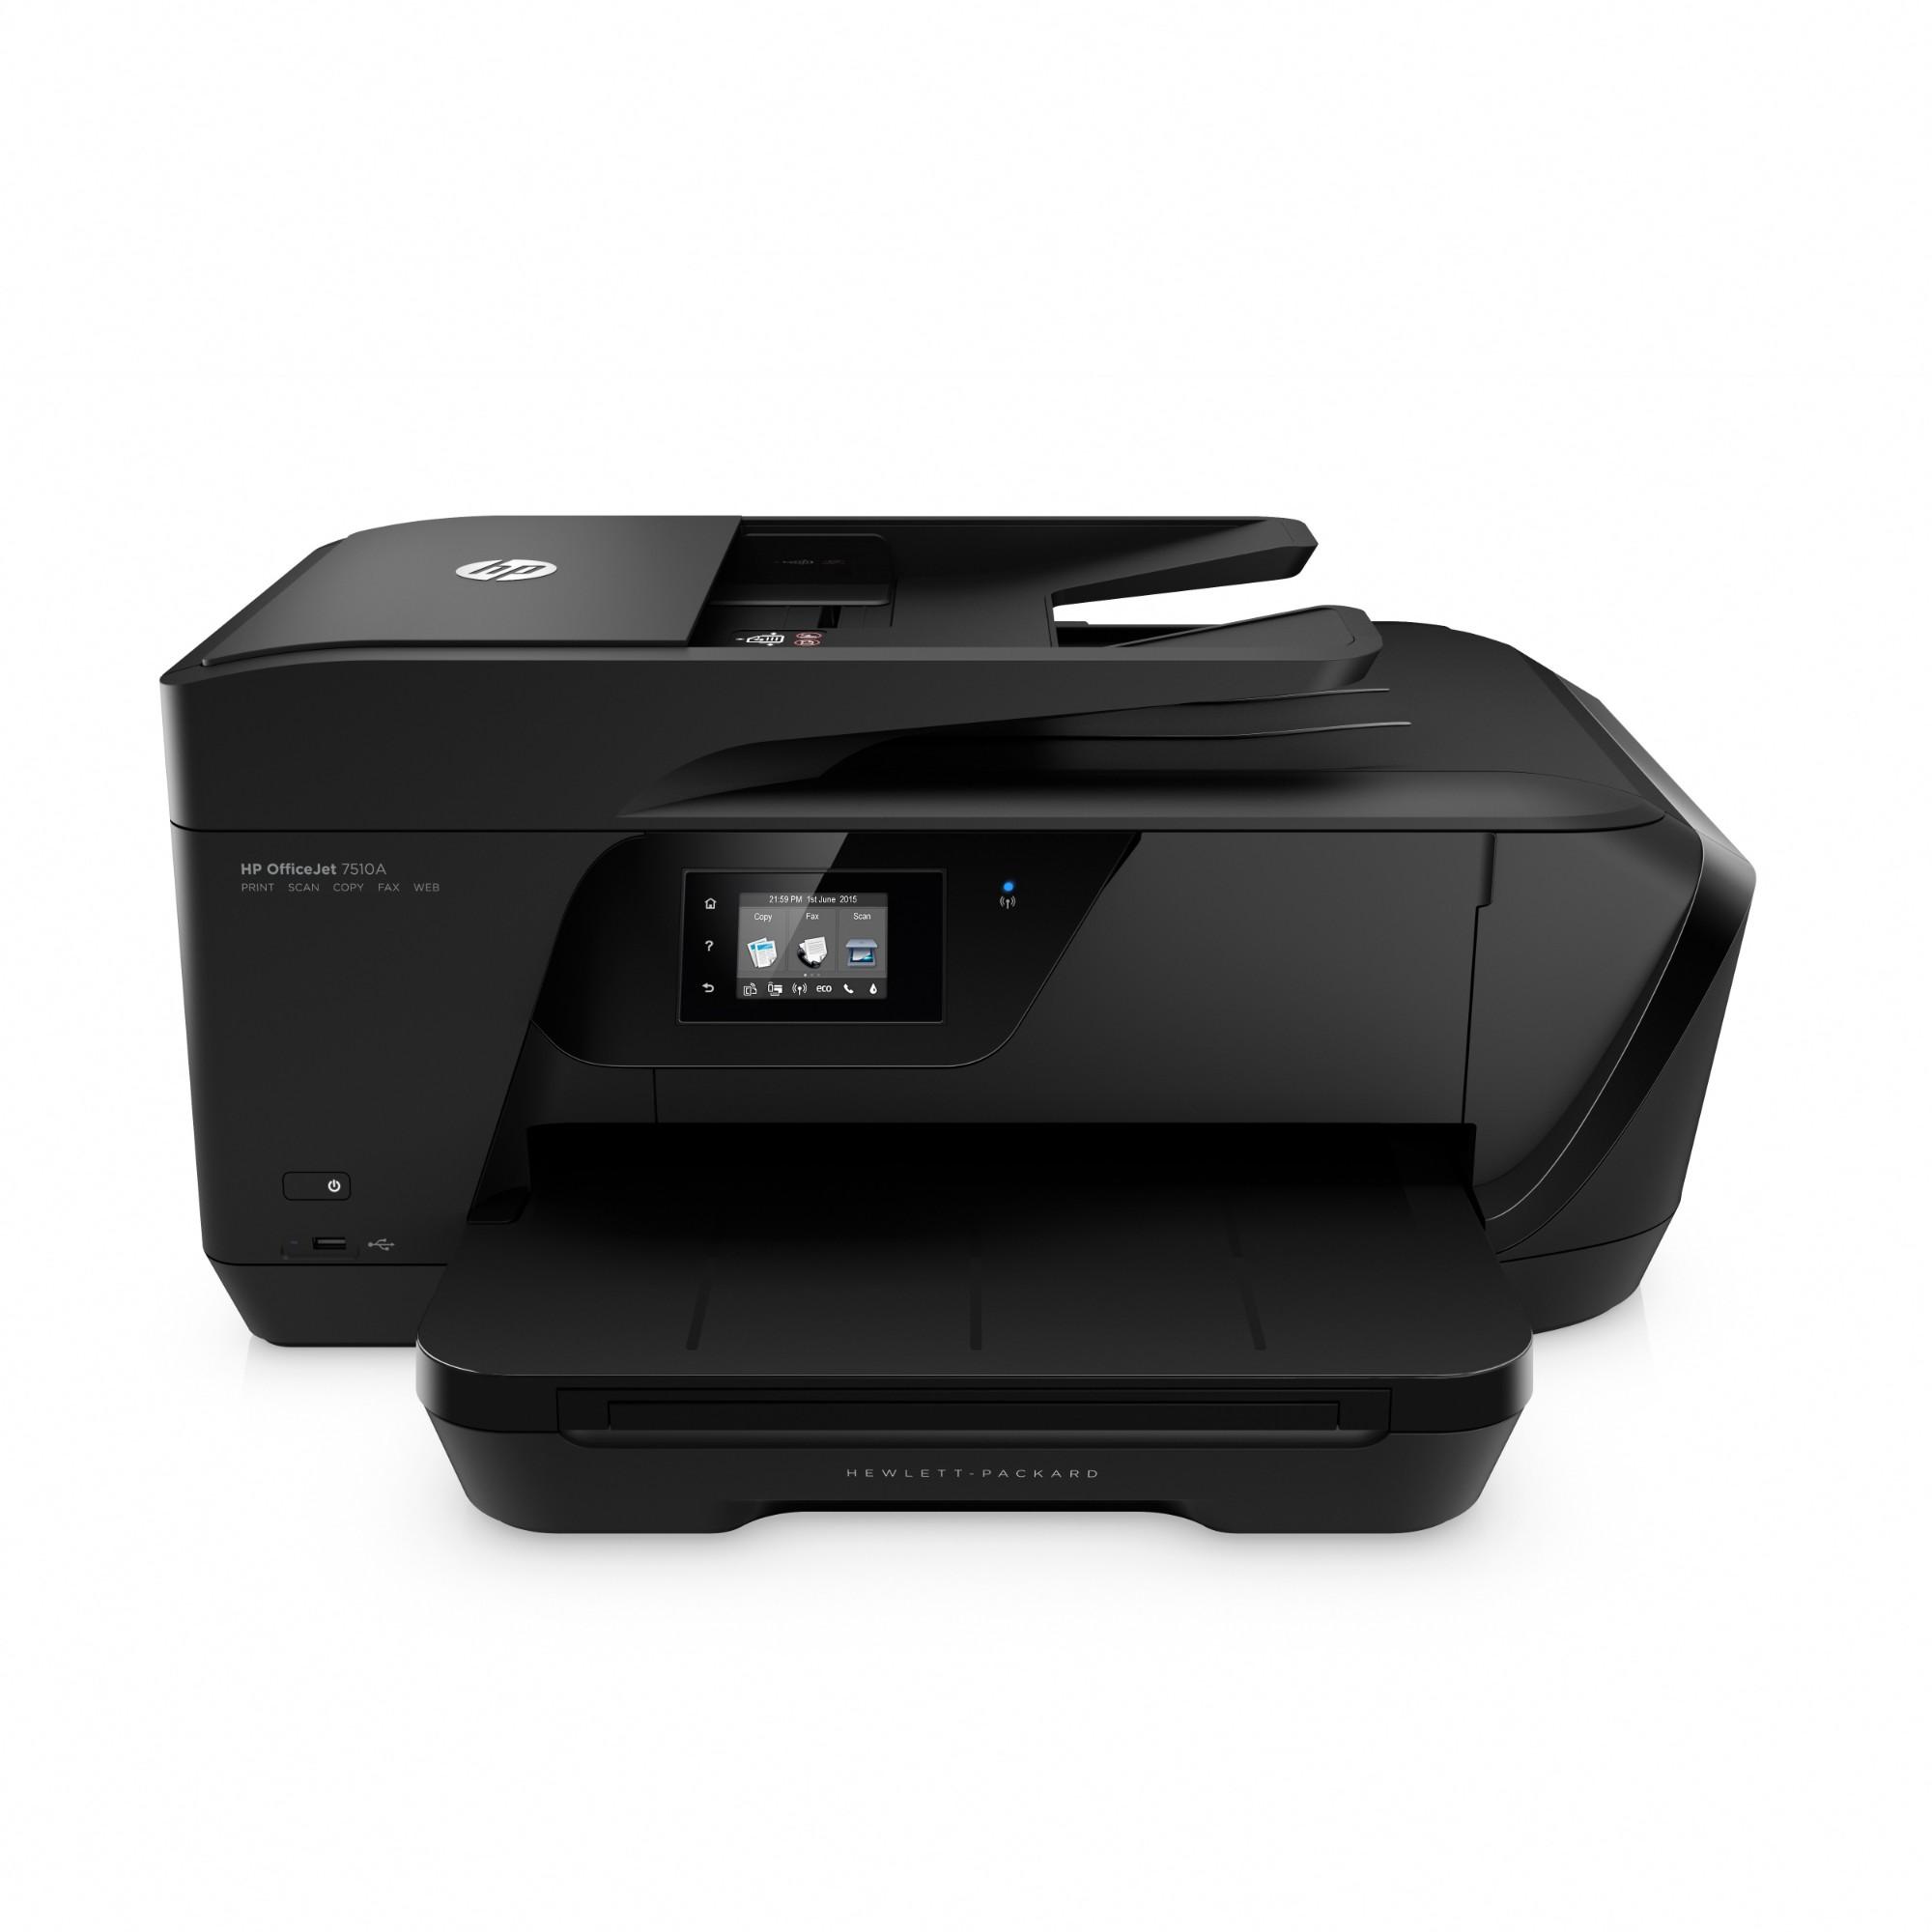 HP OfficeJet 7510 Thermal Inkjet 15 ppm 4800 x 1200 DPI A3 Wi-Fi